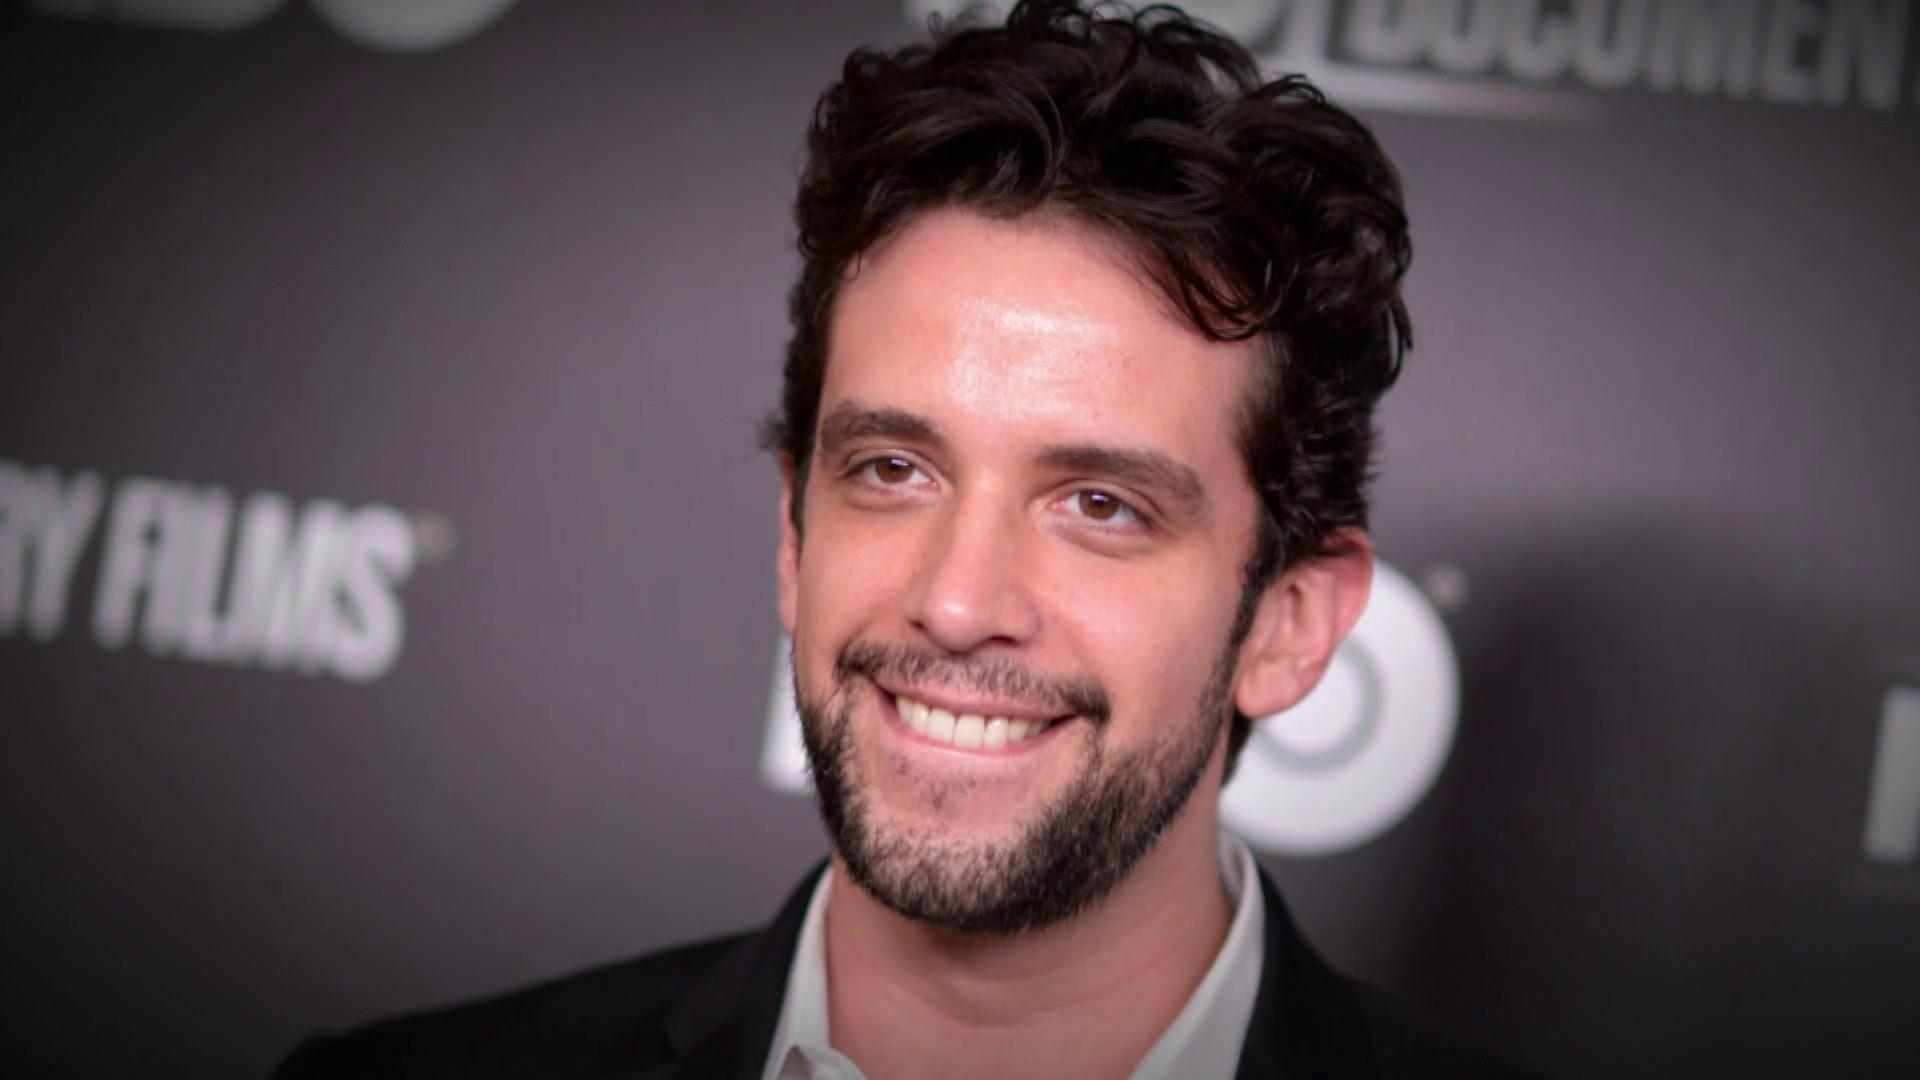 Broadway star Nick Cordero wakes from coma after leg amputation due to coronavirus